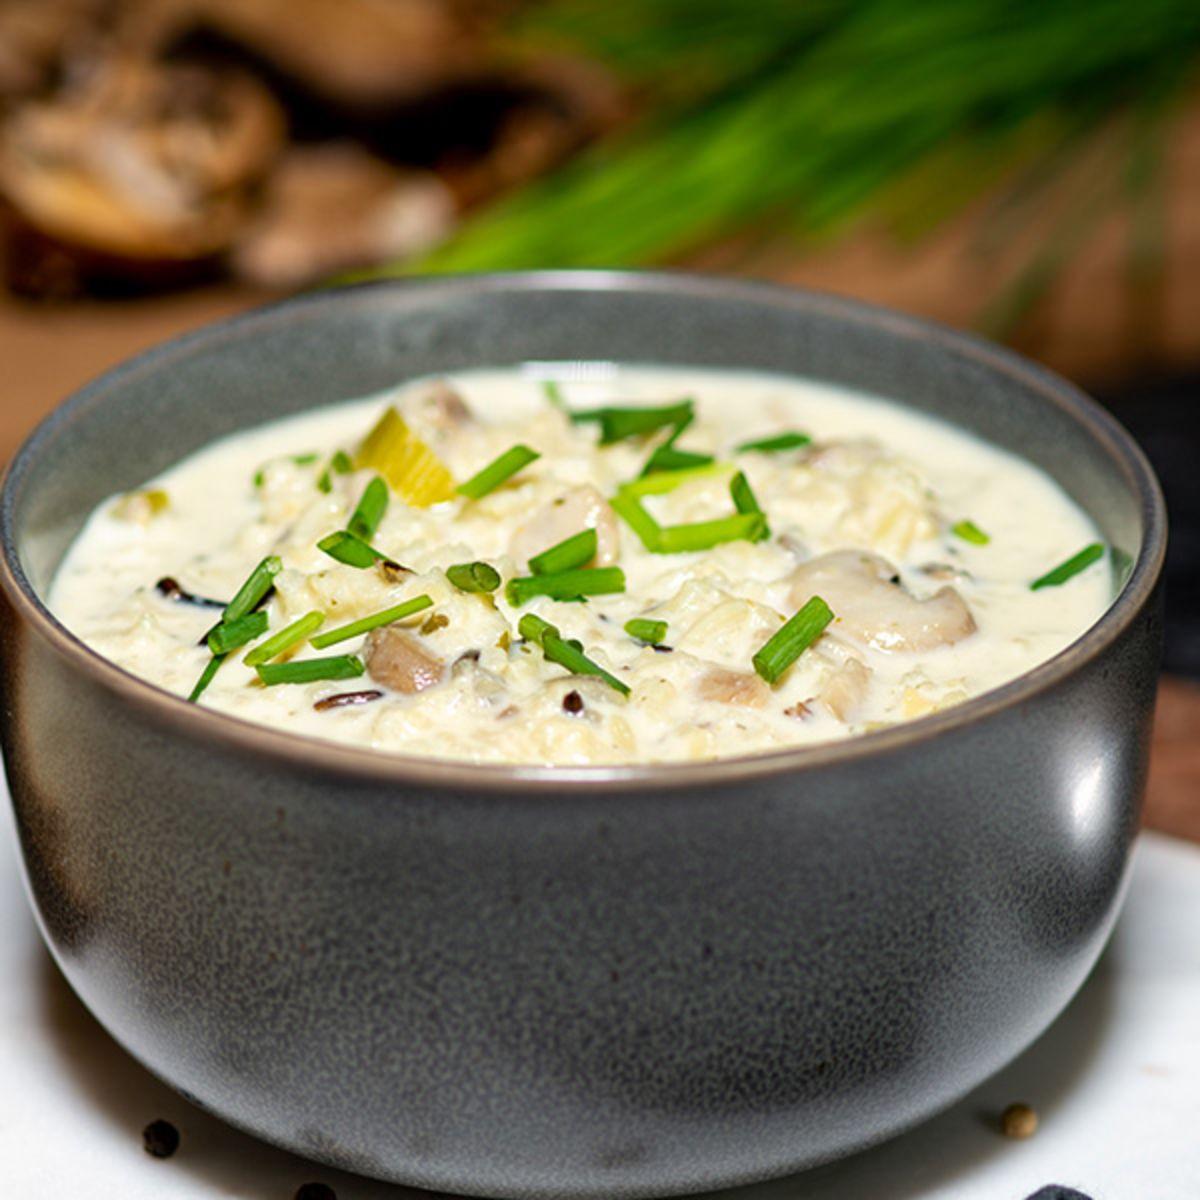 BUNN Gourmet Minnesota Wild Rice & Mushroom Soup